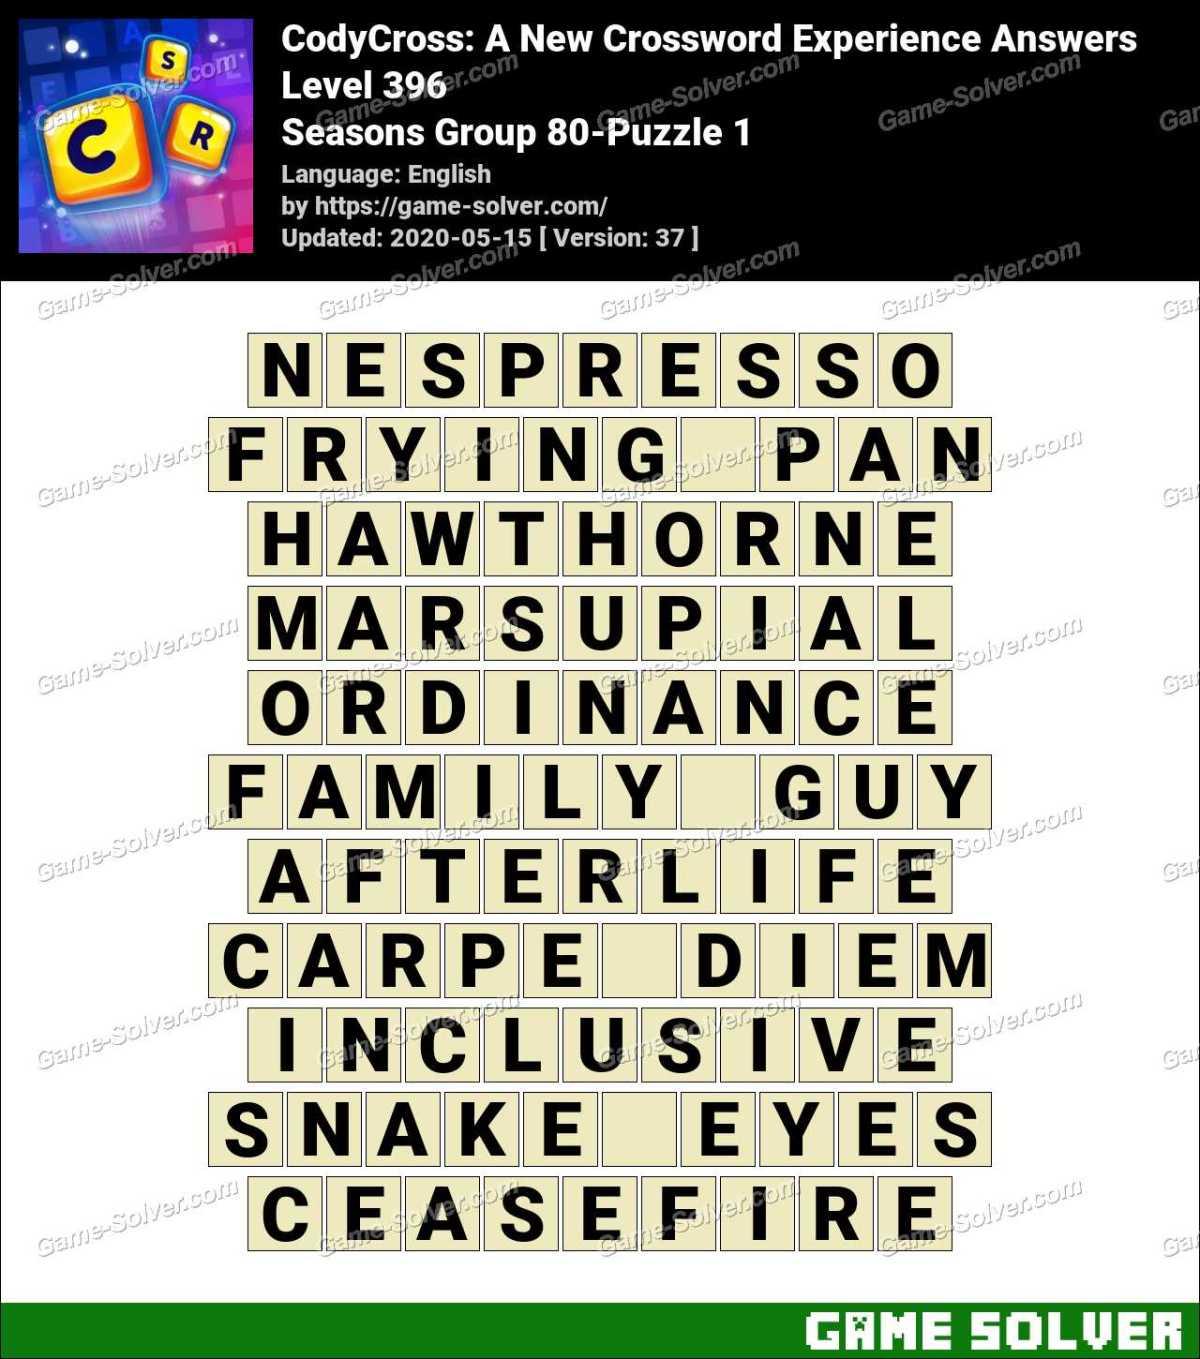 CodyCross Seasons Group 80-Puzzle 1 Answers